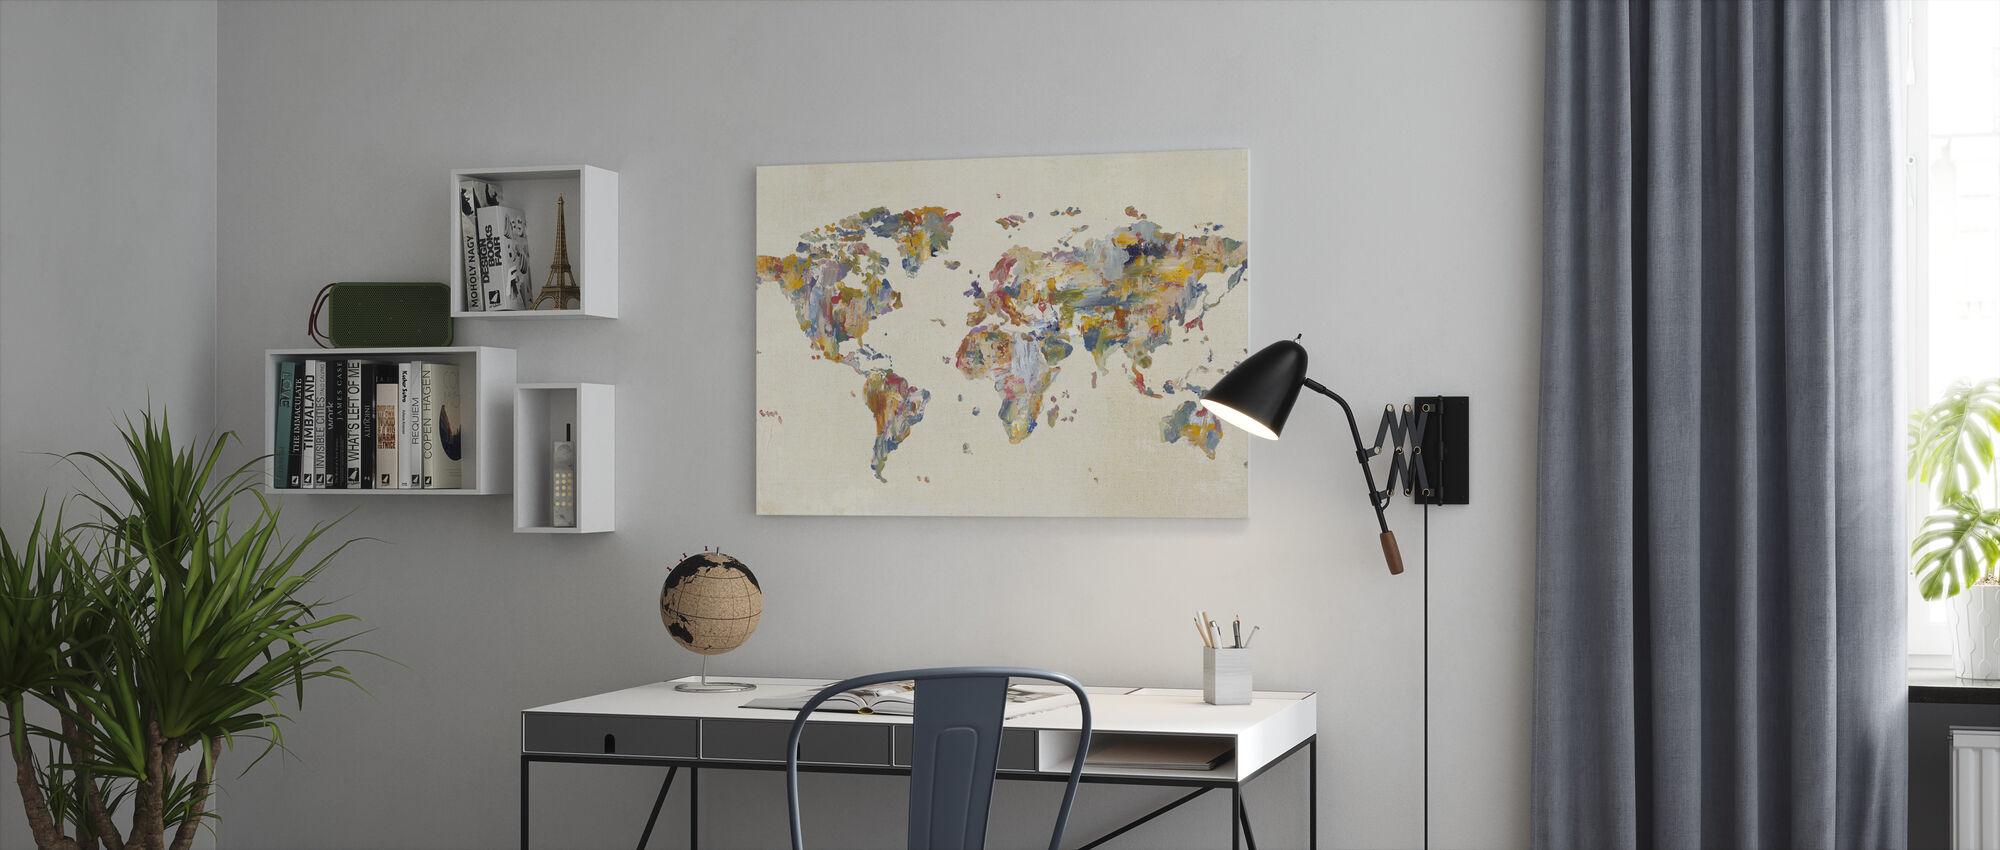 Global Palettes Map on Vintage Linen - Canvas print - Office